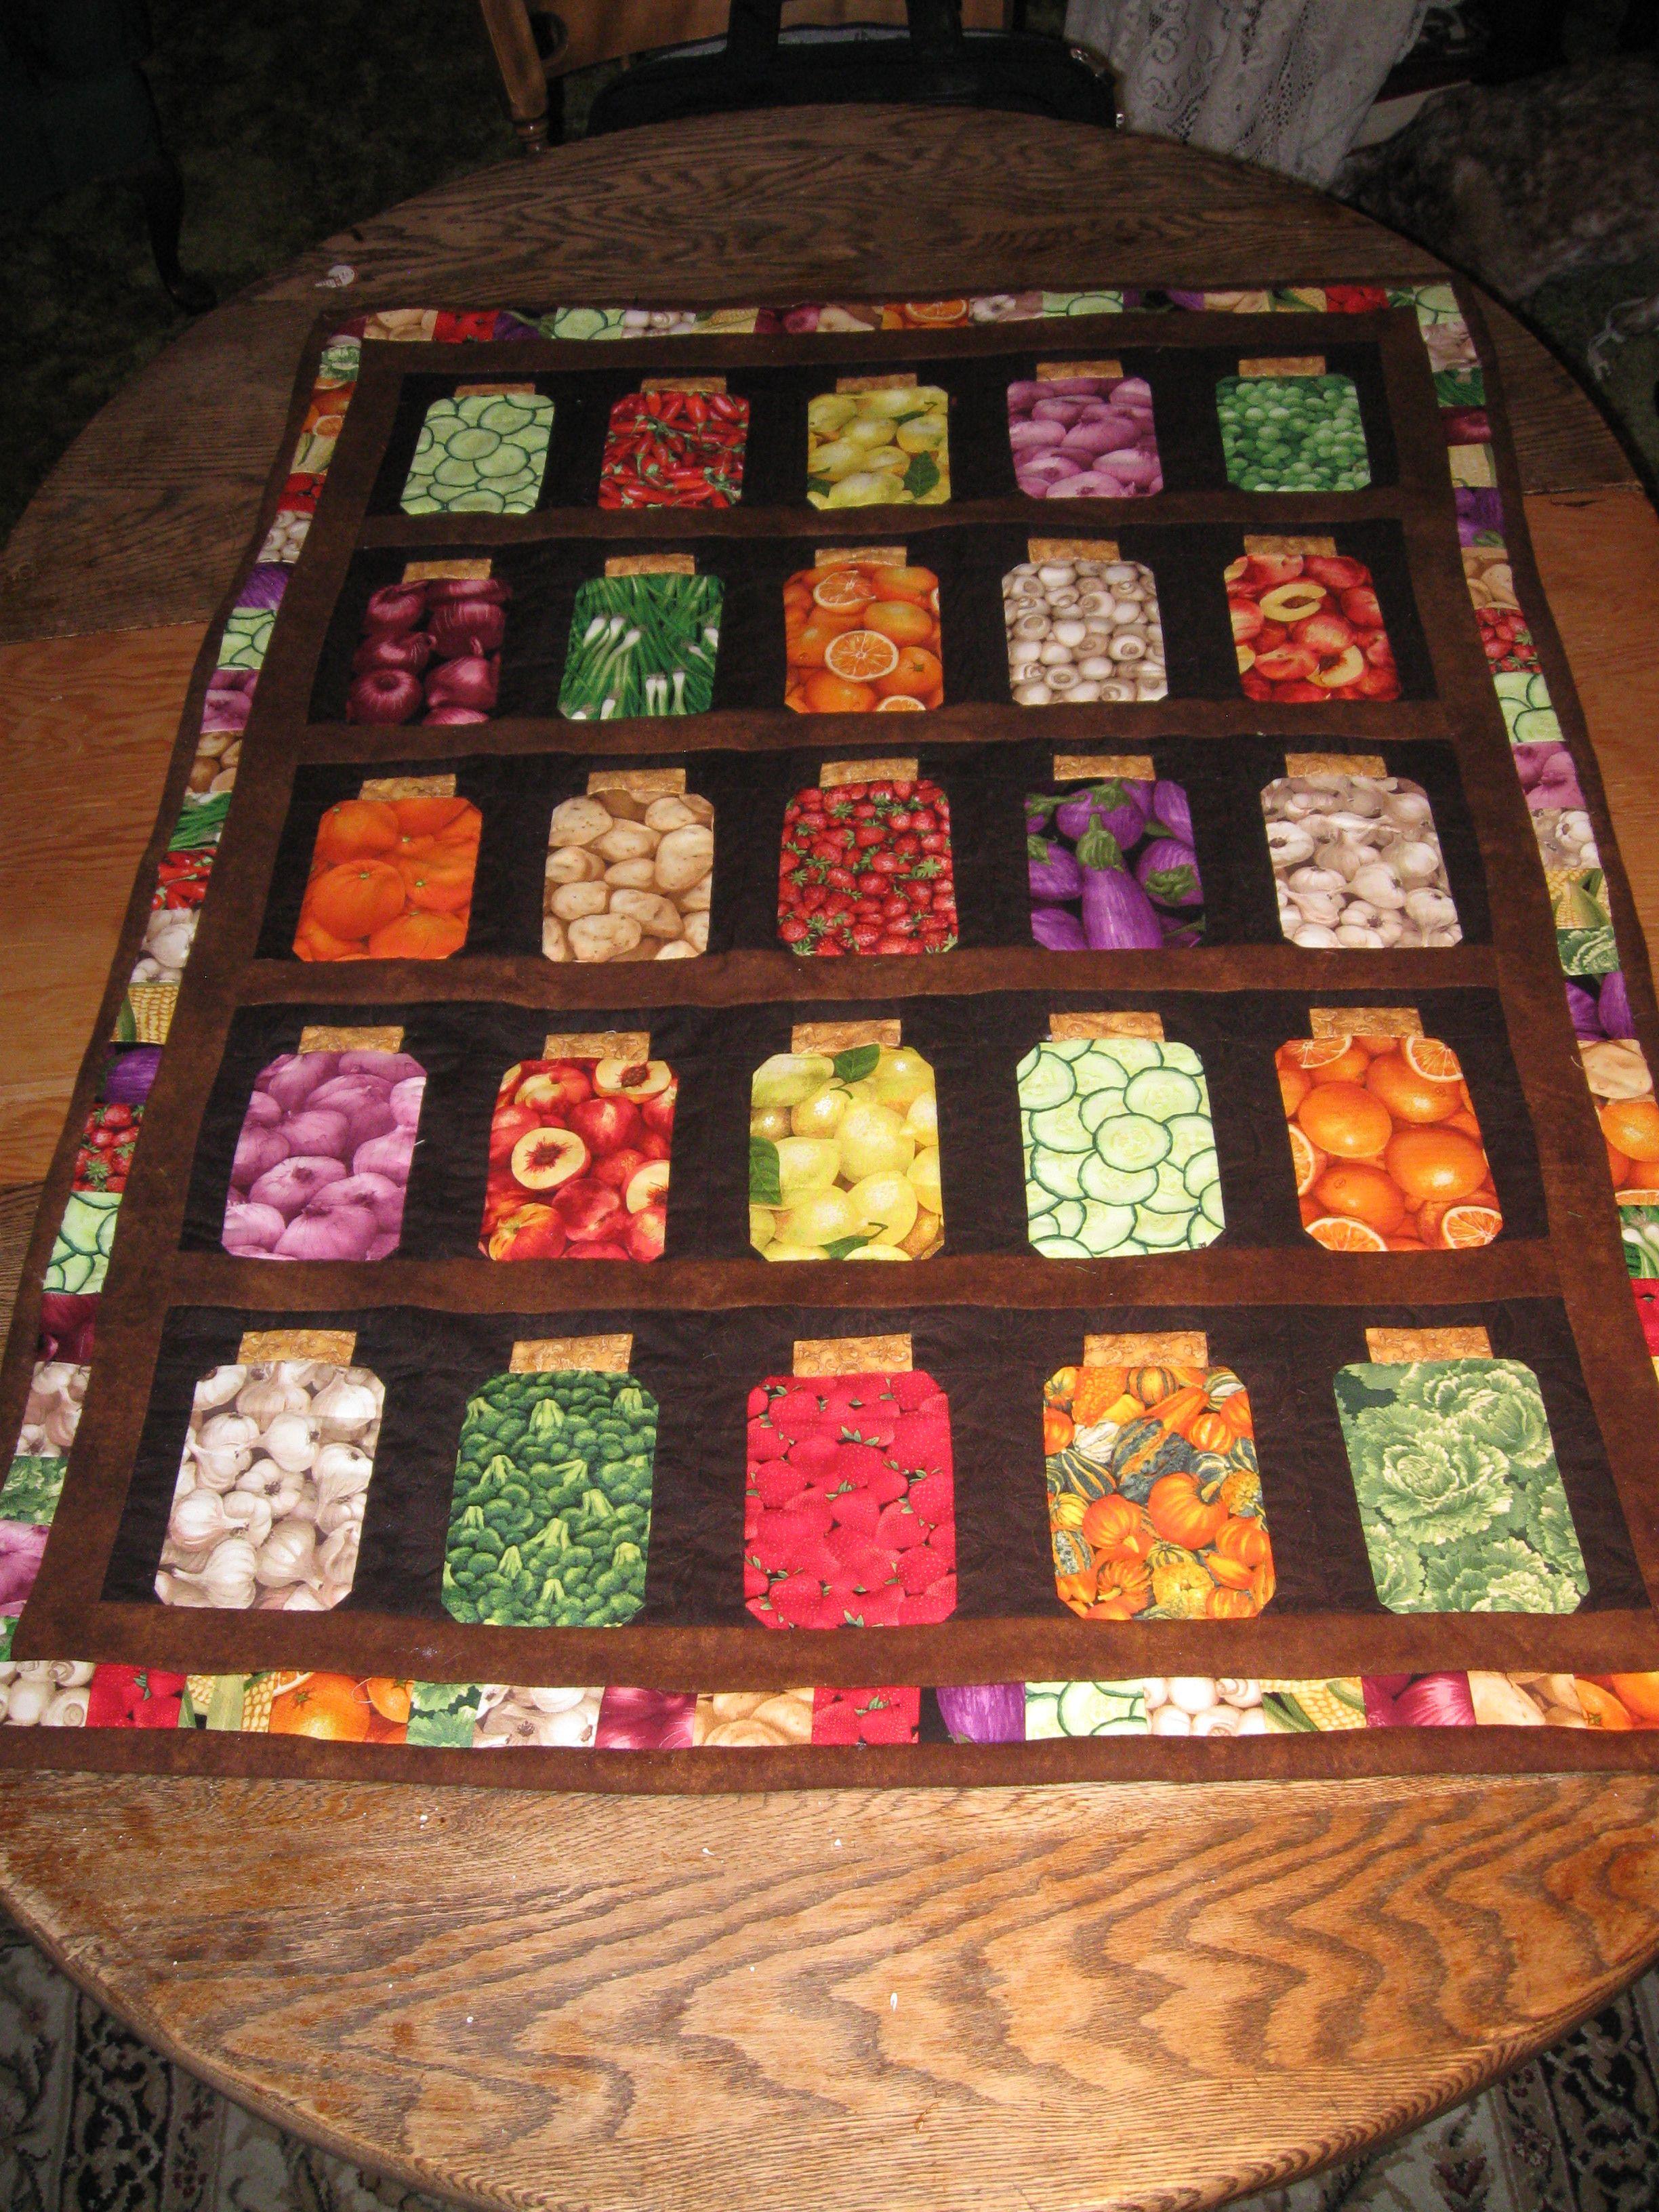 Bug Jar Quilt I made last winter | Quilts | Pinterest | Jar ... : bugs in a jar quilt pattern - Adamdwight.com